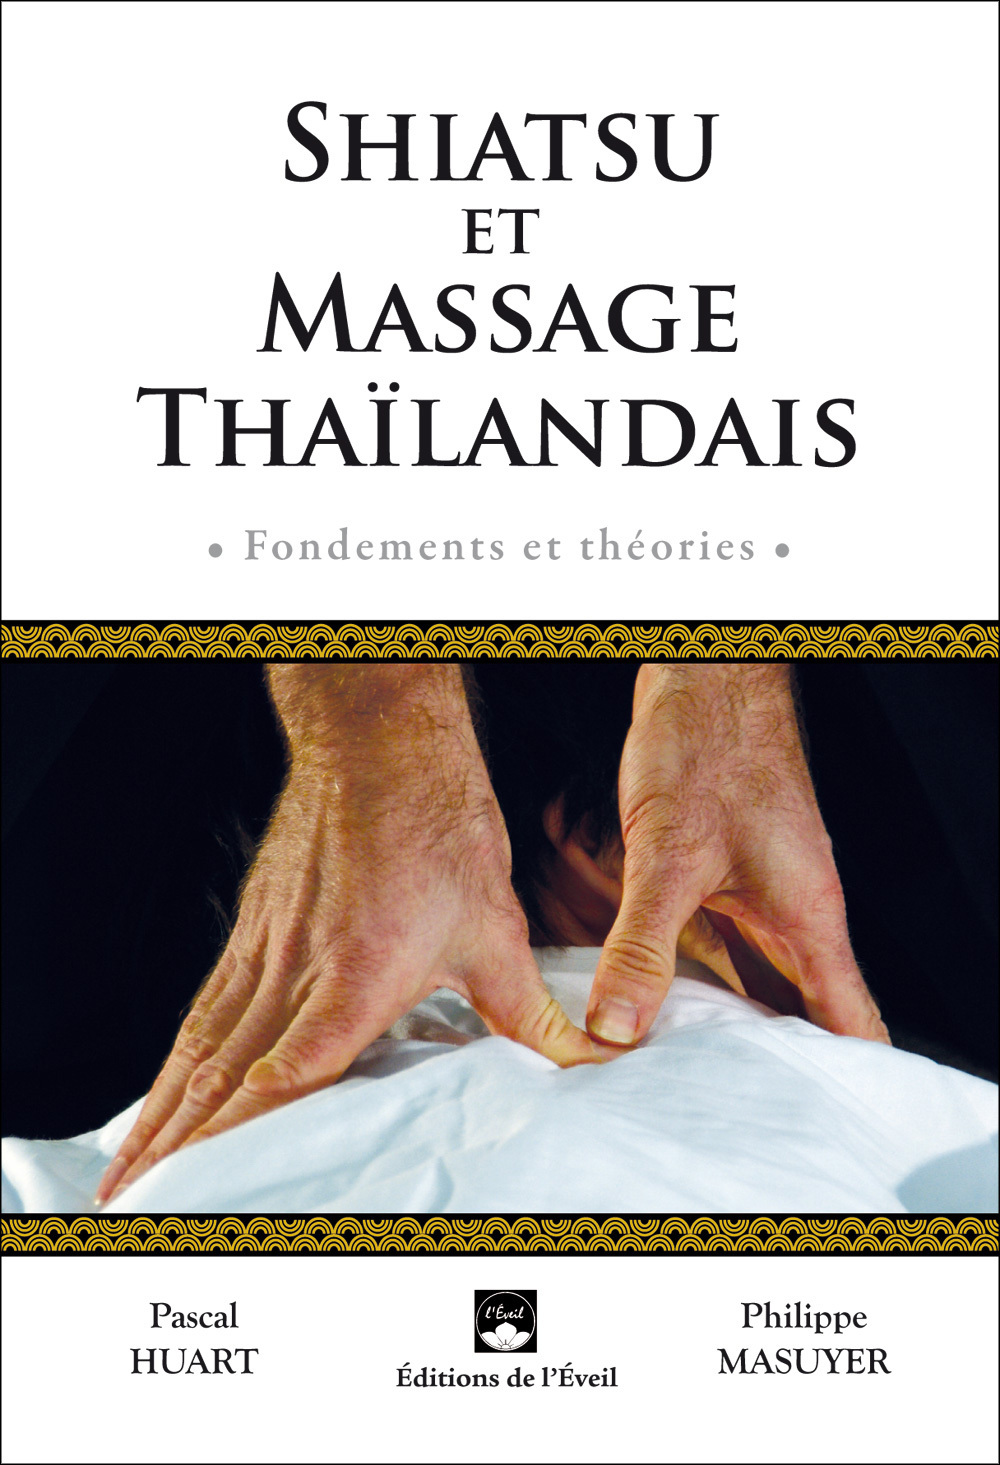 SHIATSU ET MASSAGE THAILANDAIS